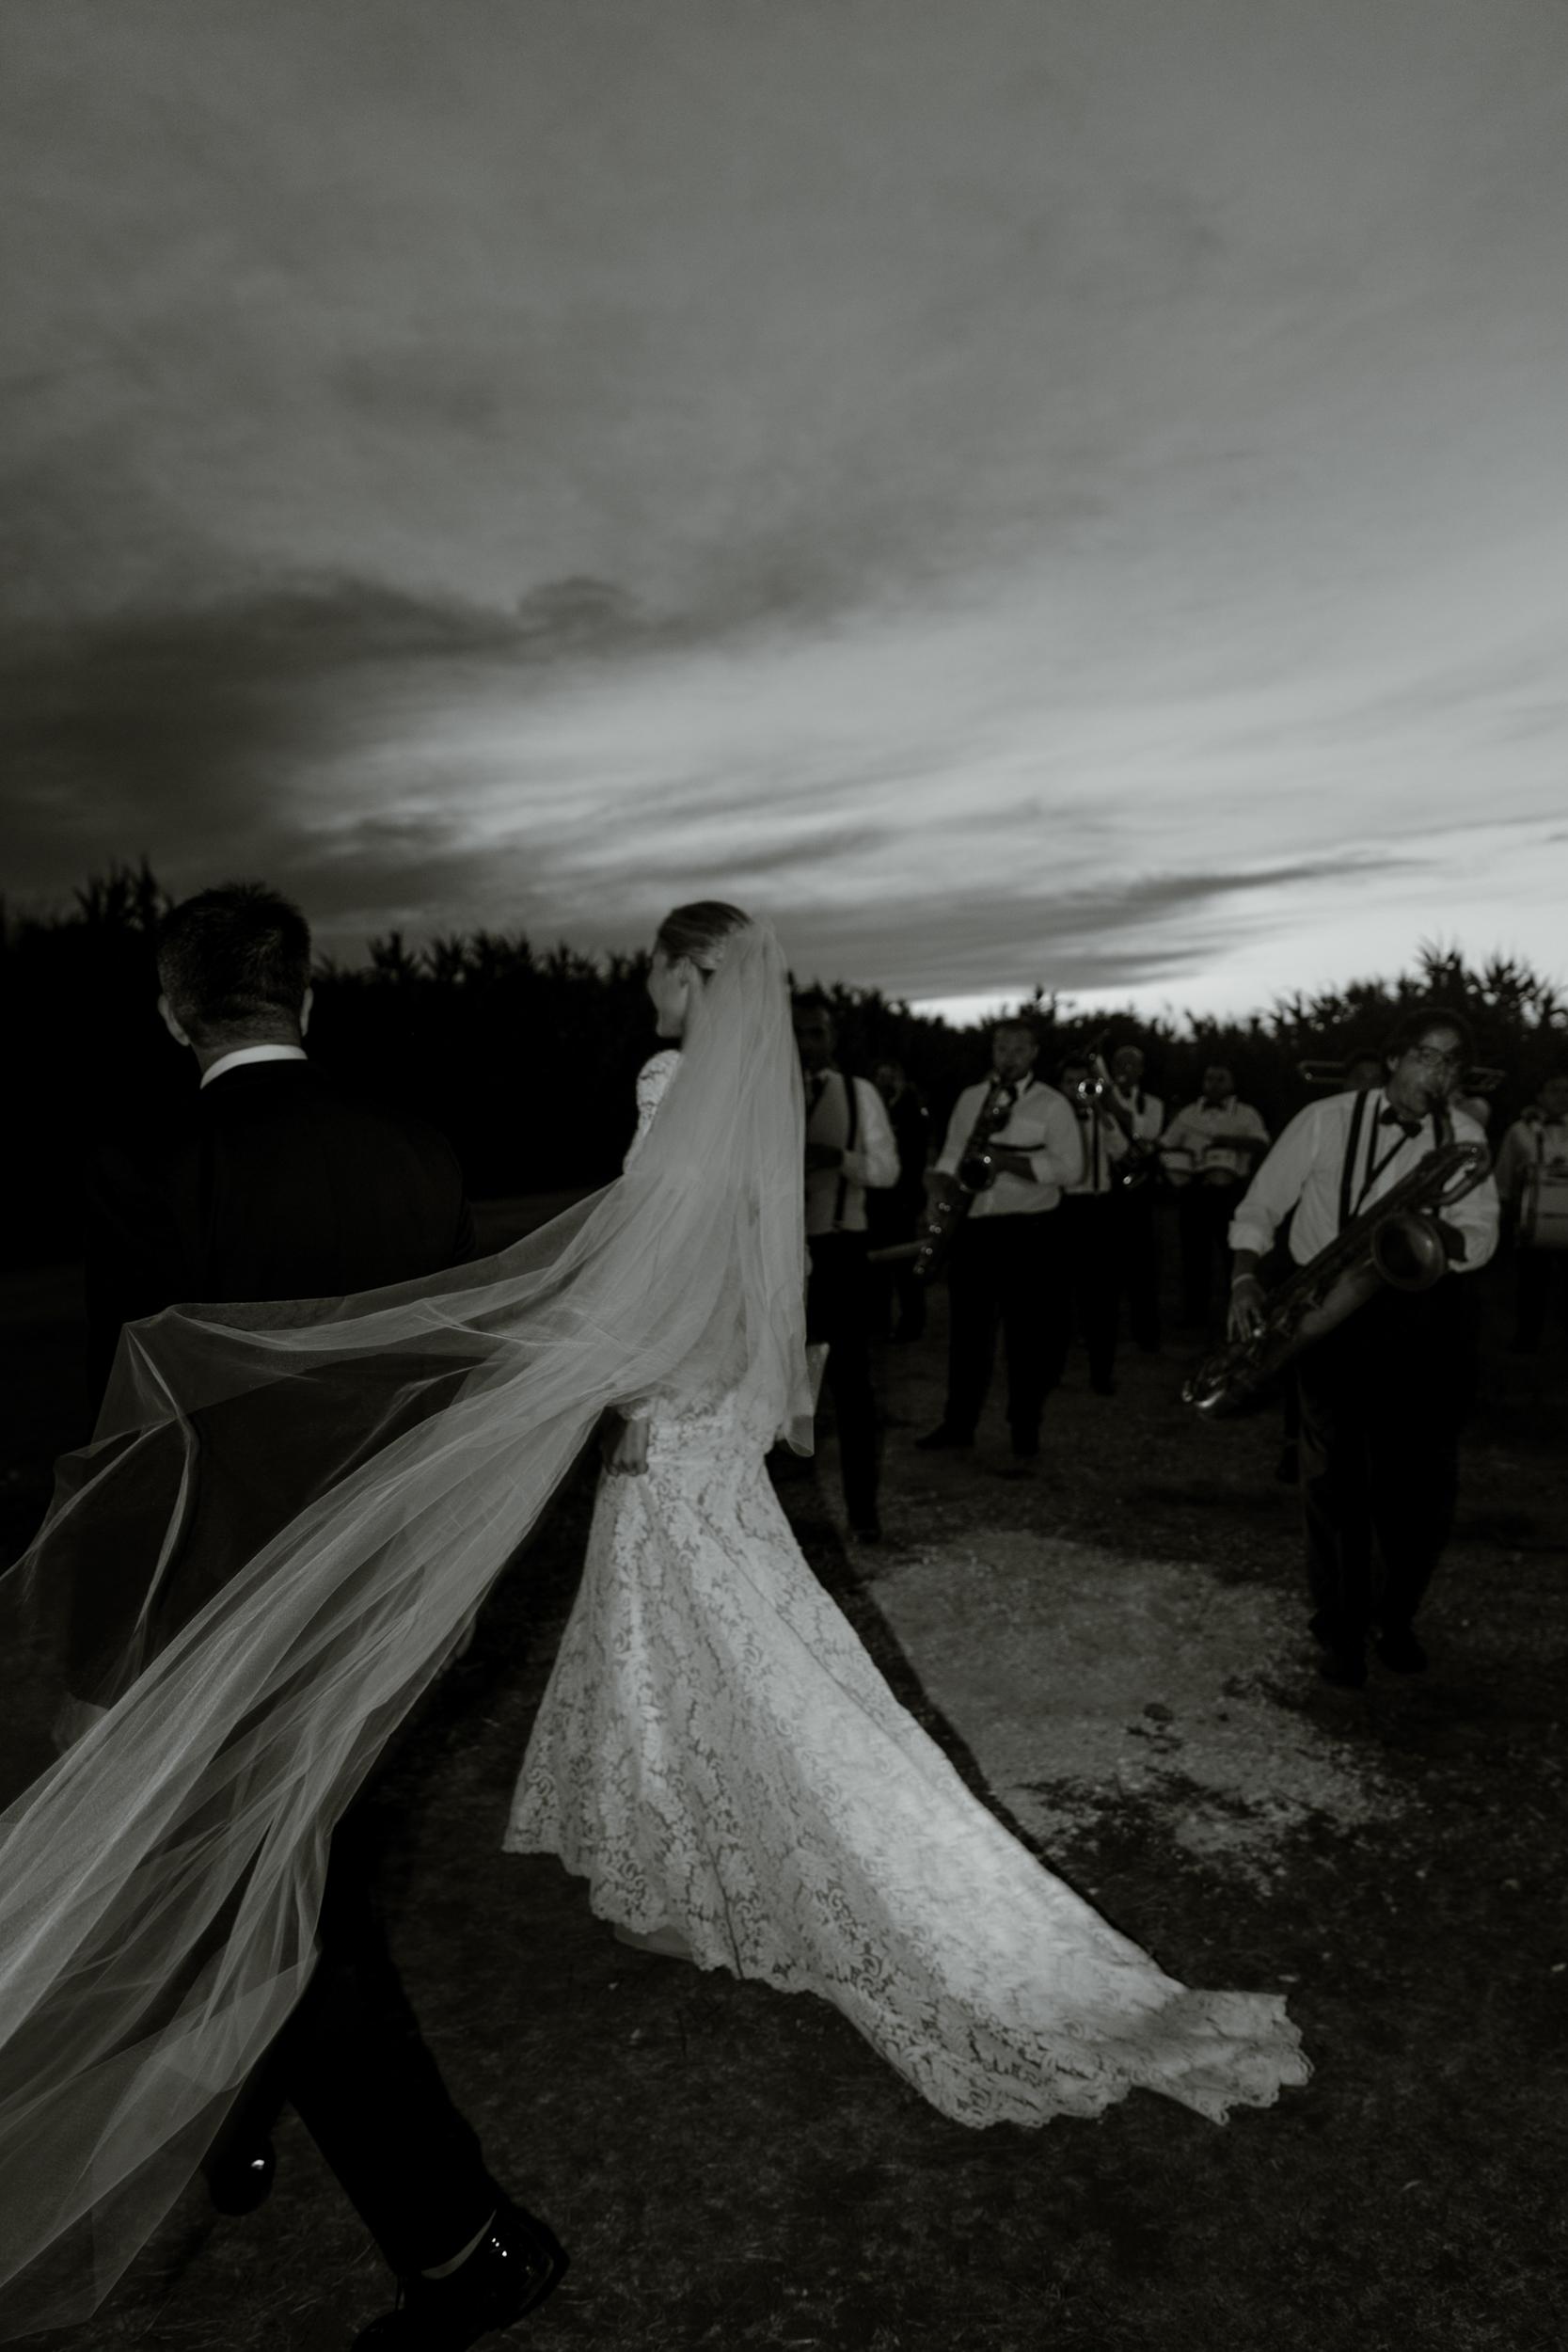 marching-band-wedding.jpg